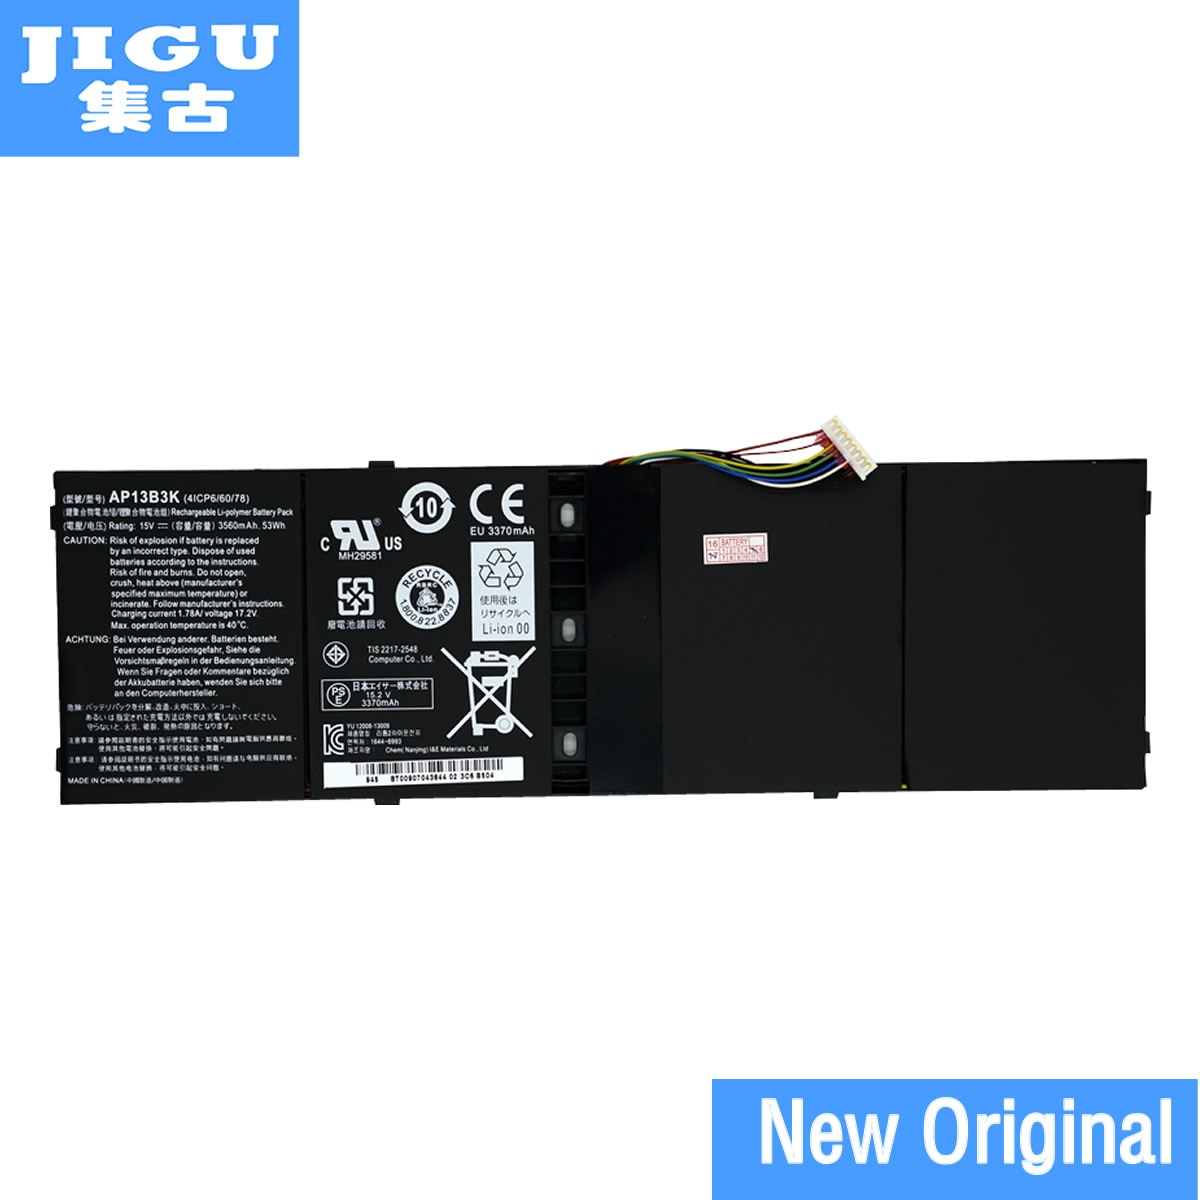 JIGU, batería para ordenador portátil, 4ICP6/60/78 AP13B3K para Acer Aspire R7 R7-571 R7-572 V5-572P V5-573 V7-482P V5-573